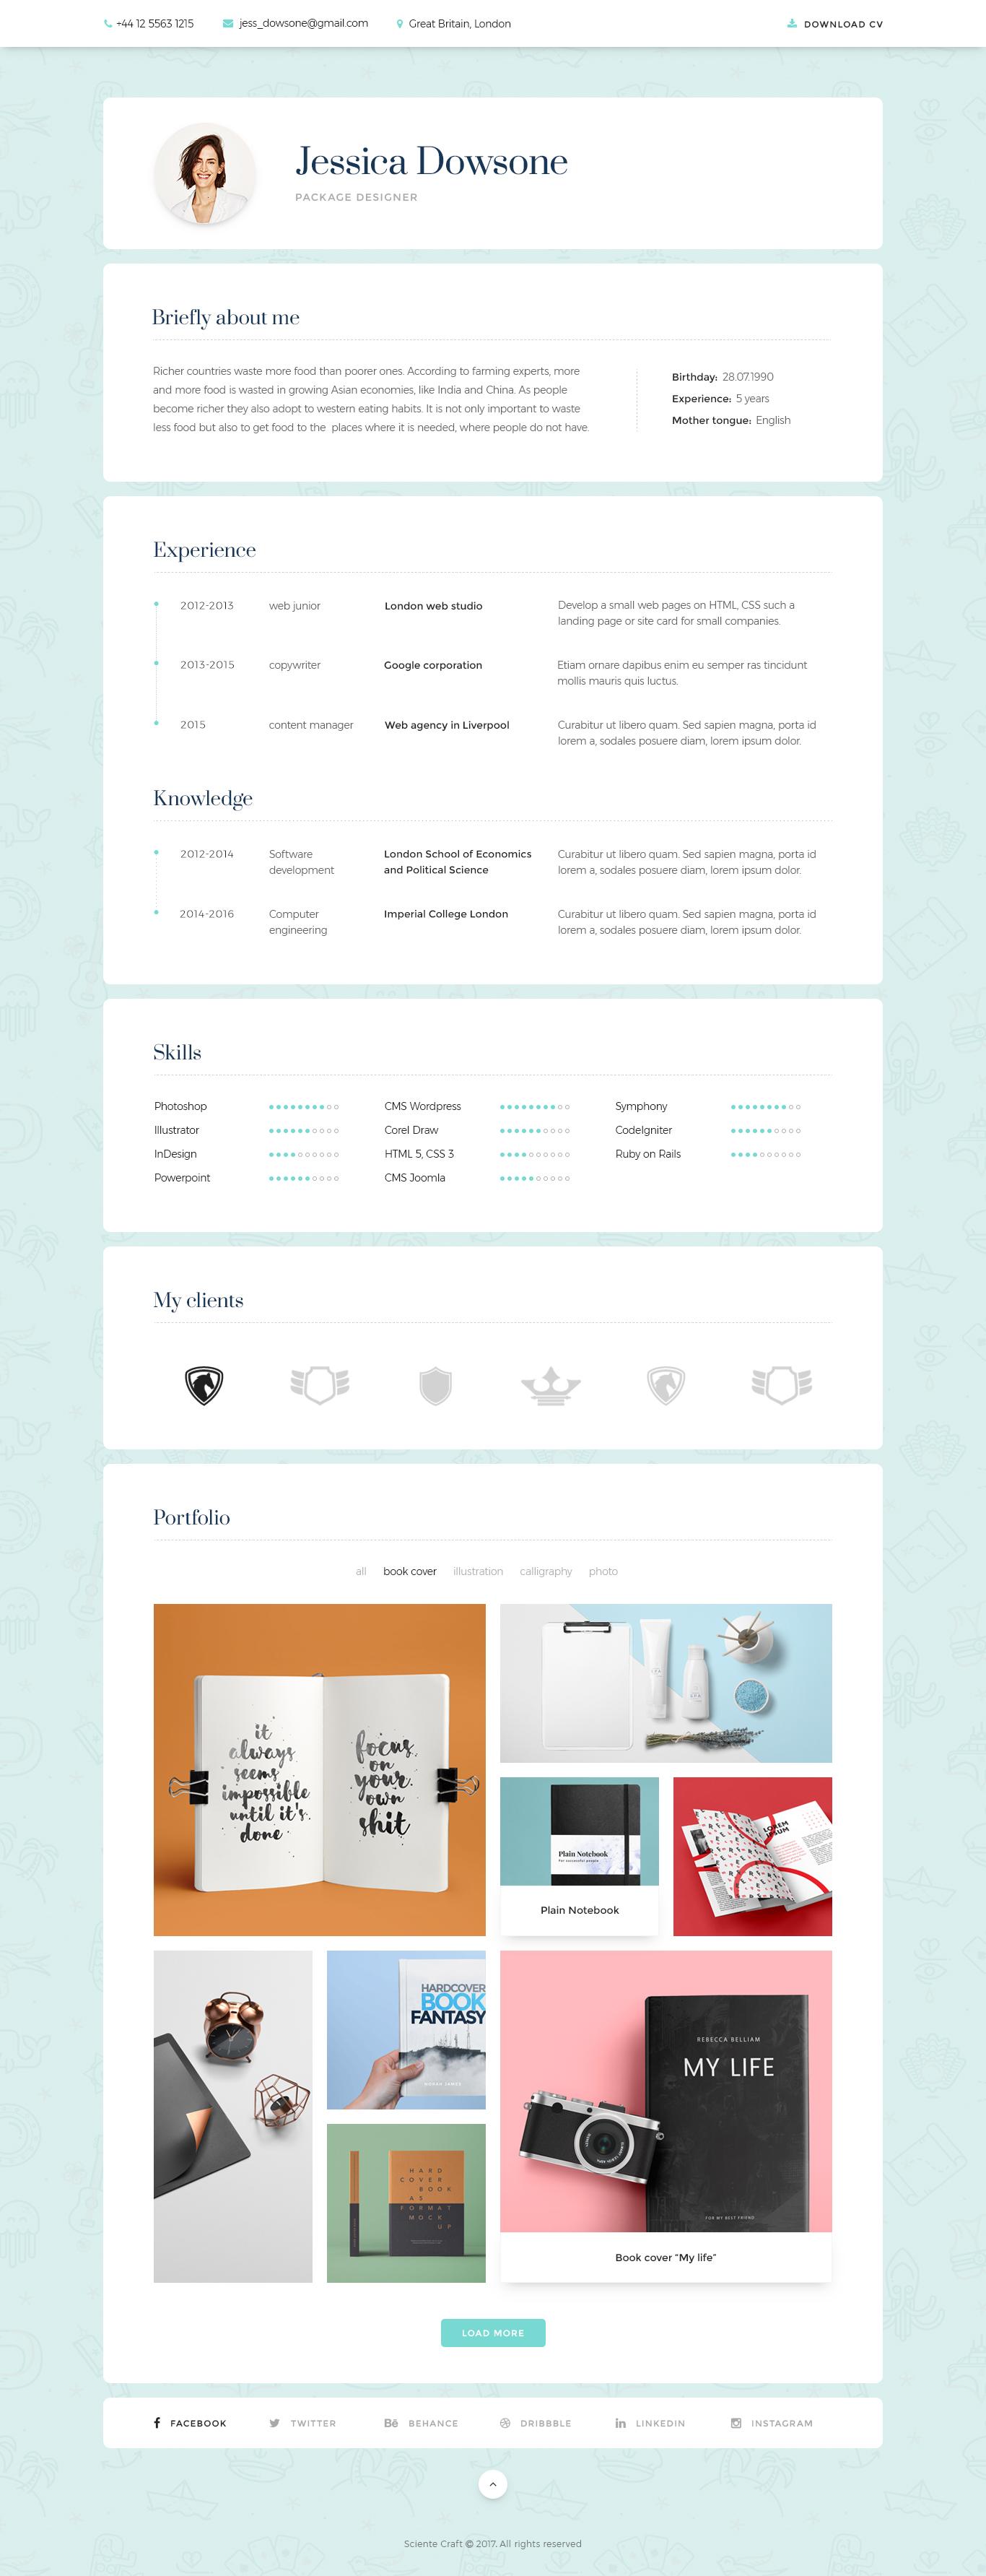 Lofty cv resume template by scientecraftdesign themeforest lofty cv resume template yelopaper Images